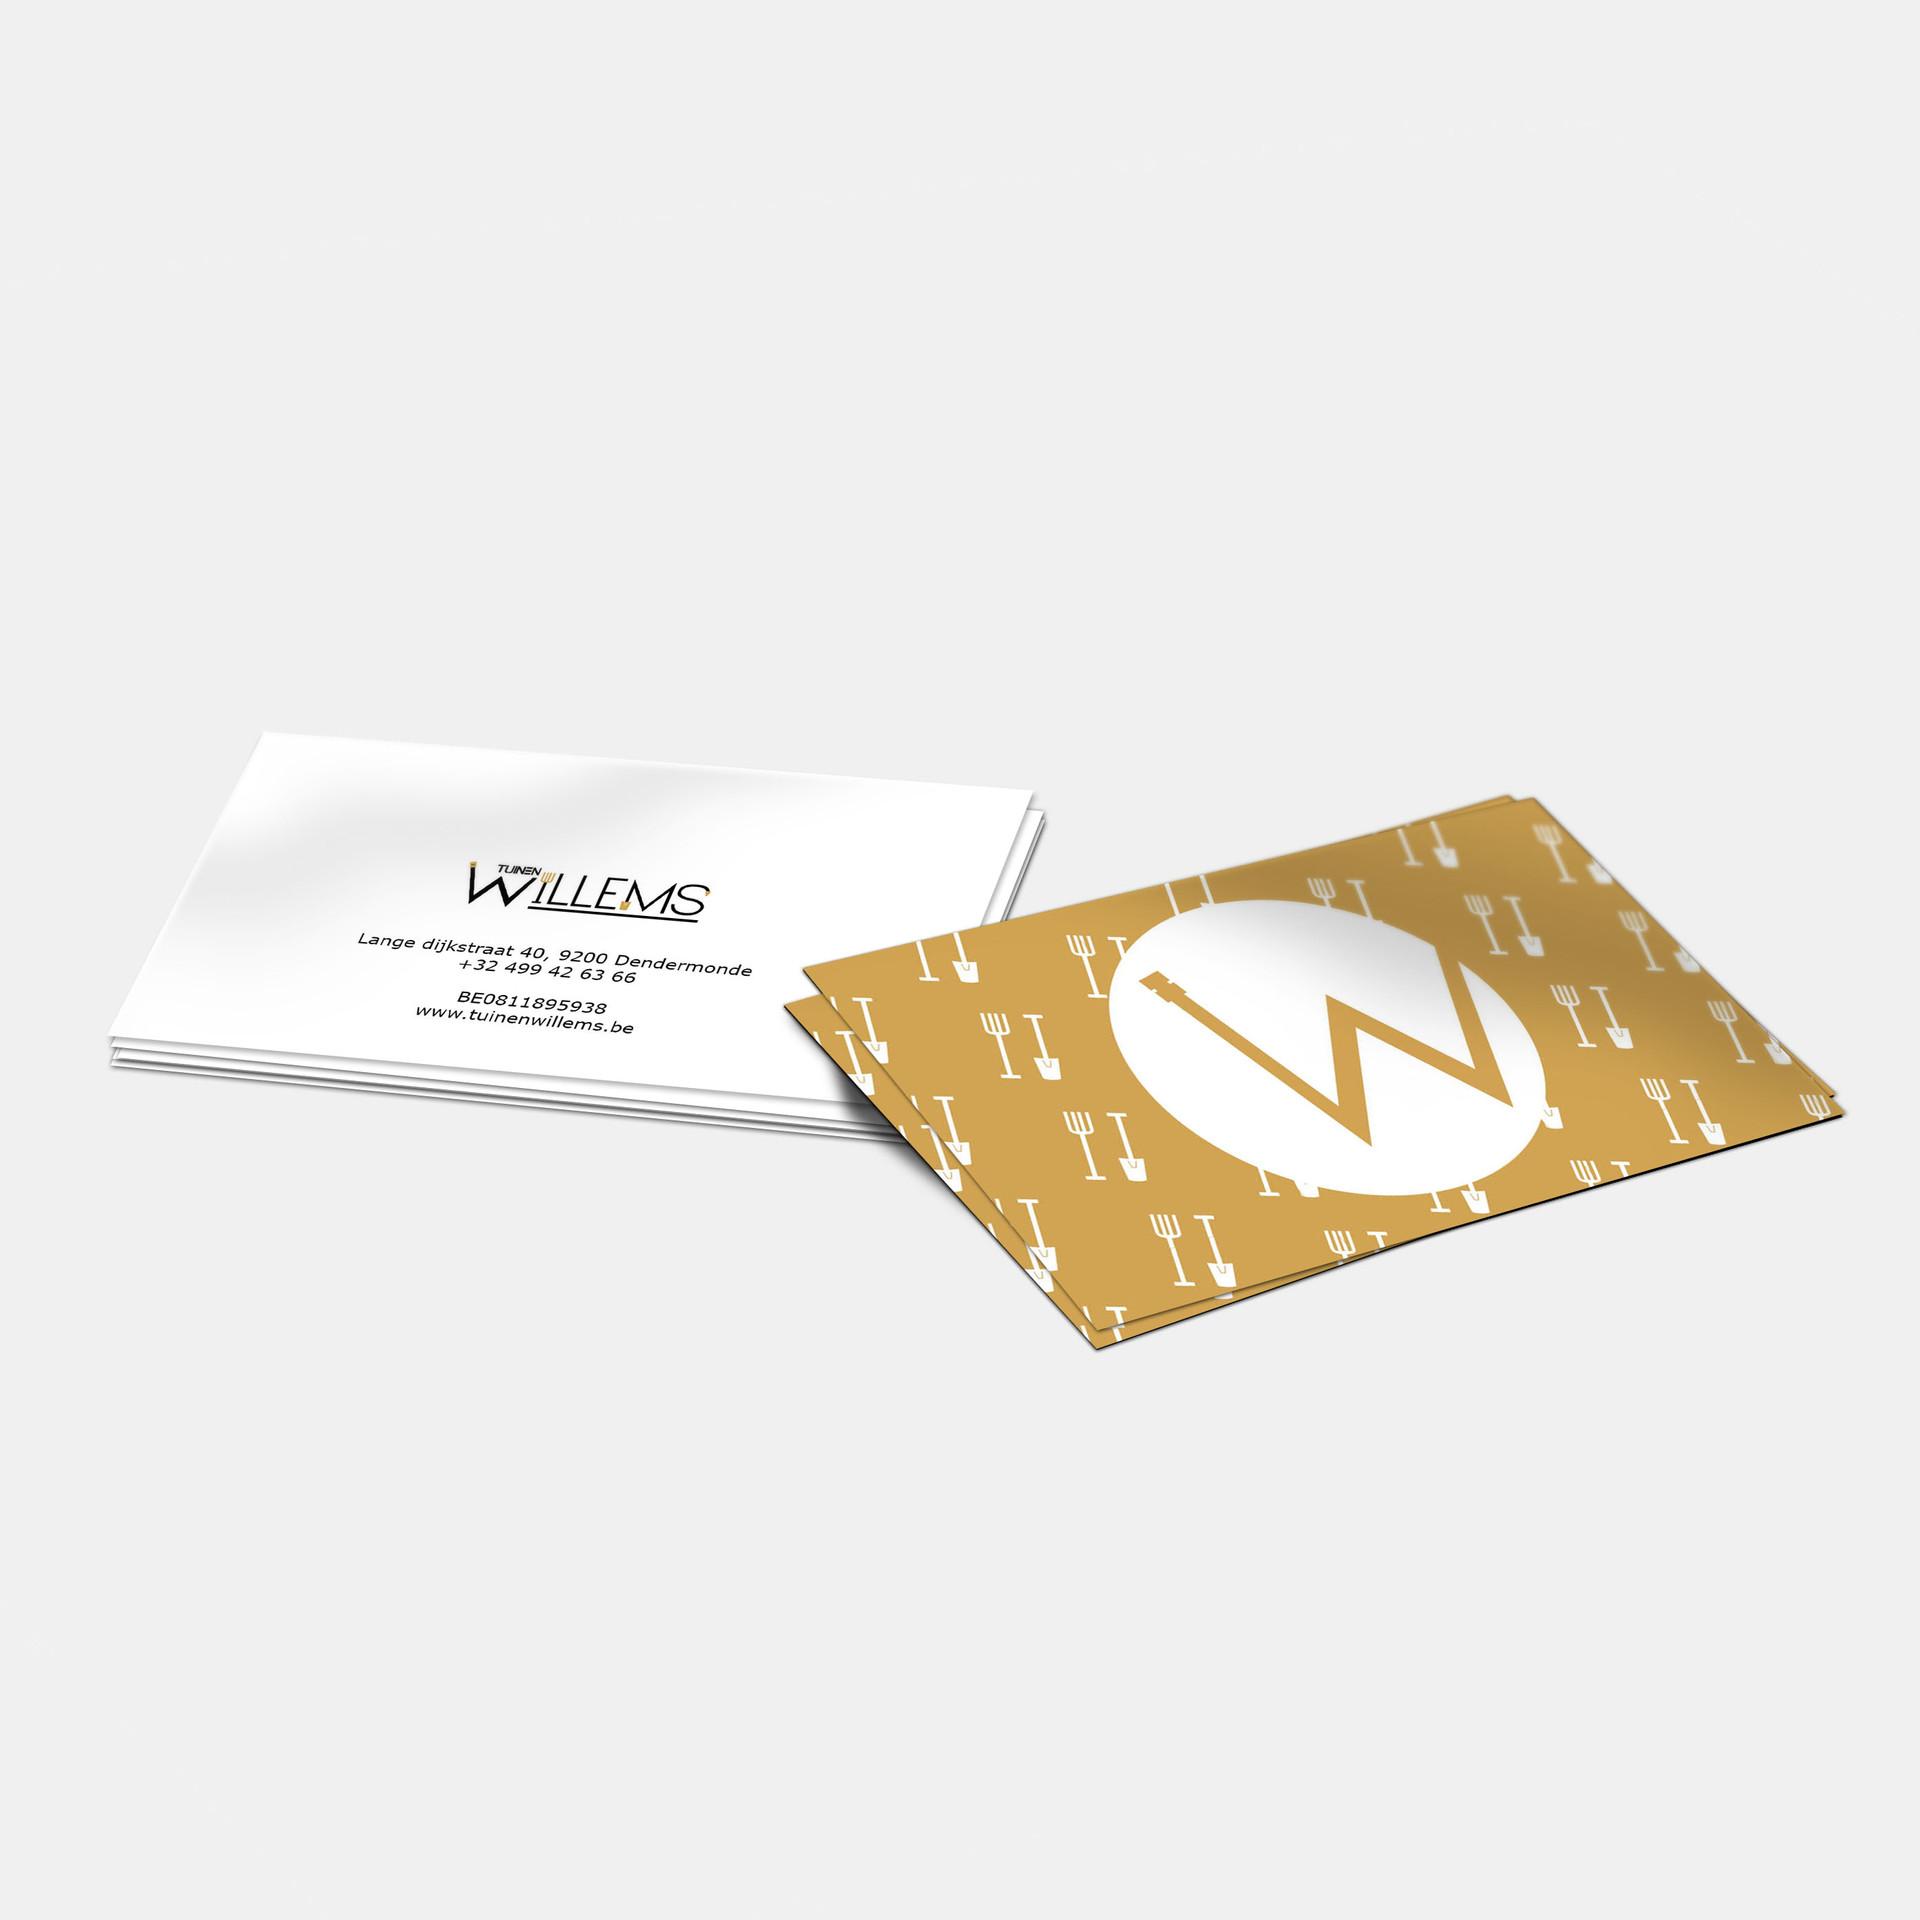 TuinenWillems Businesscard (3).jpg